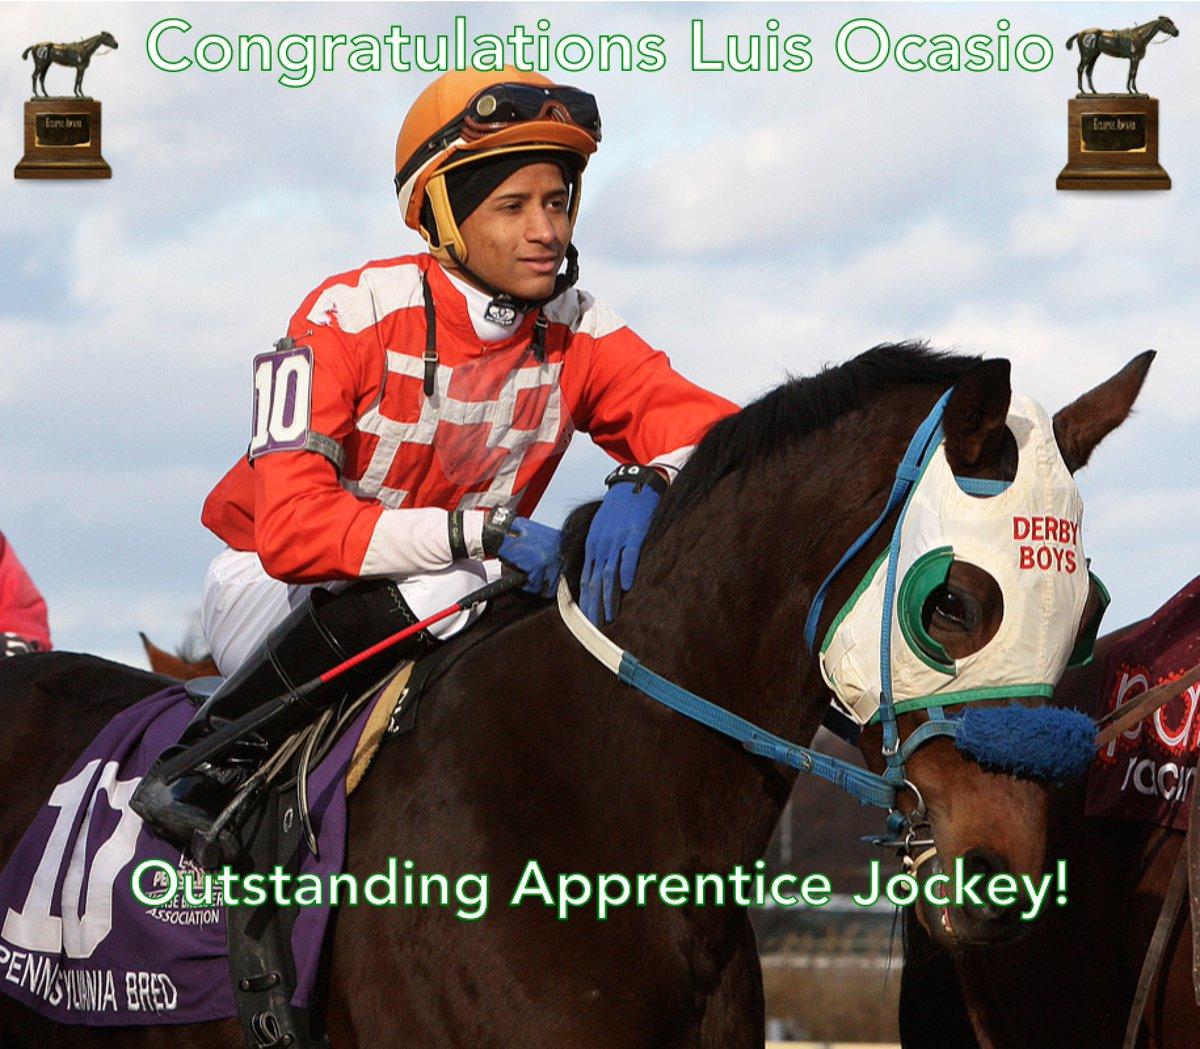 Congratulations Luis Ocasio, the 2016 #EclipseAwards winner for Outsta...